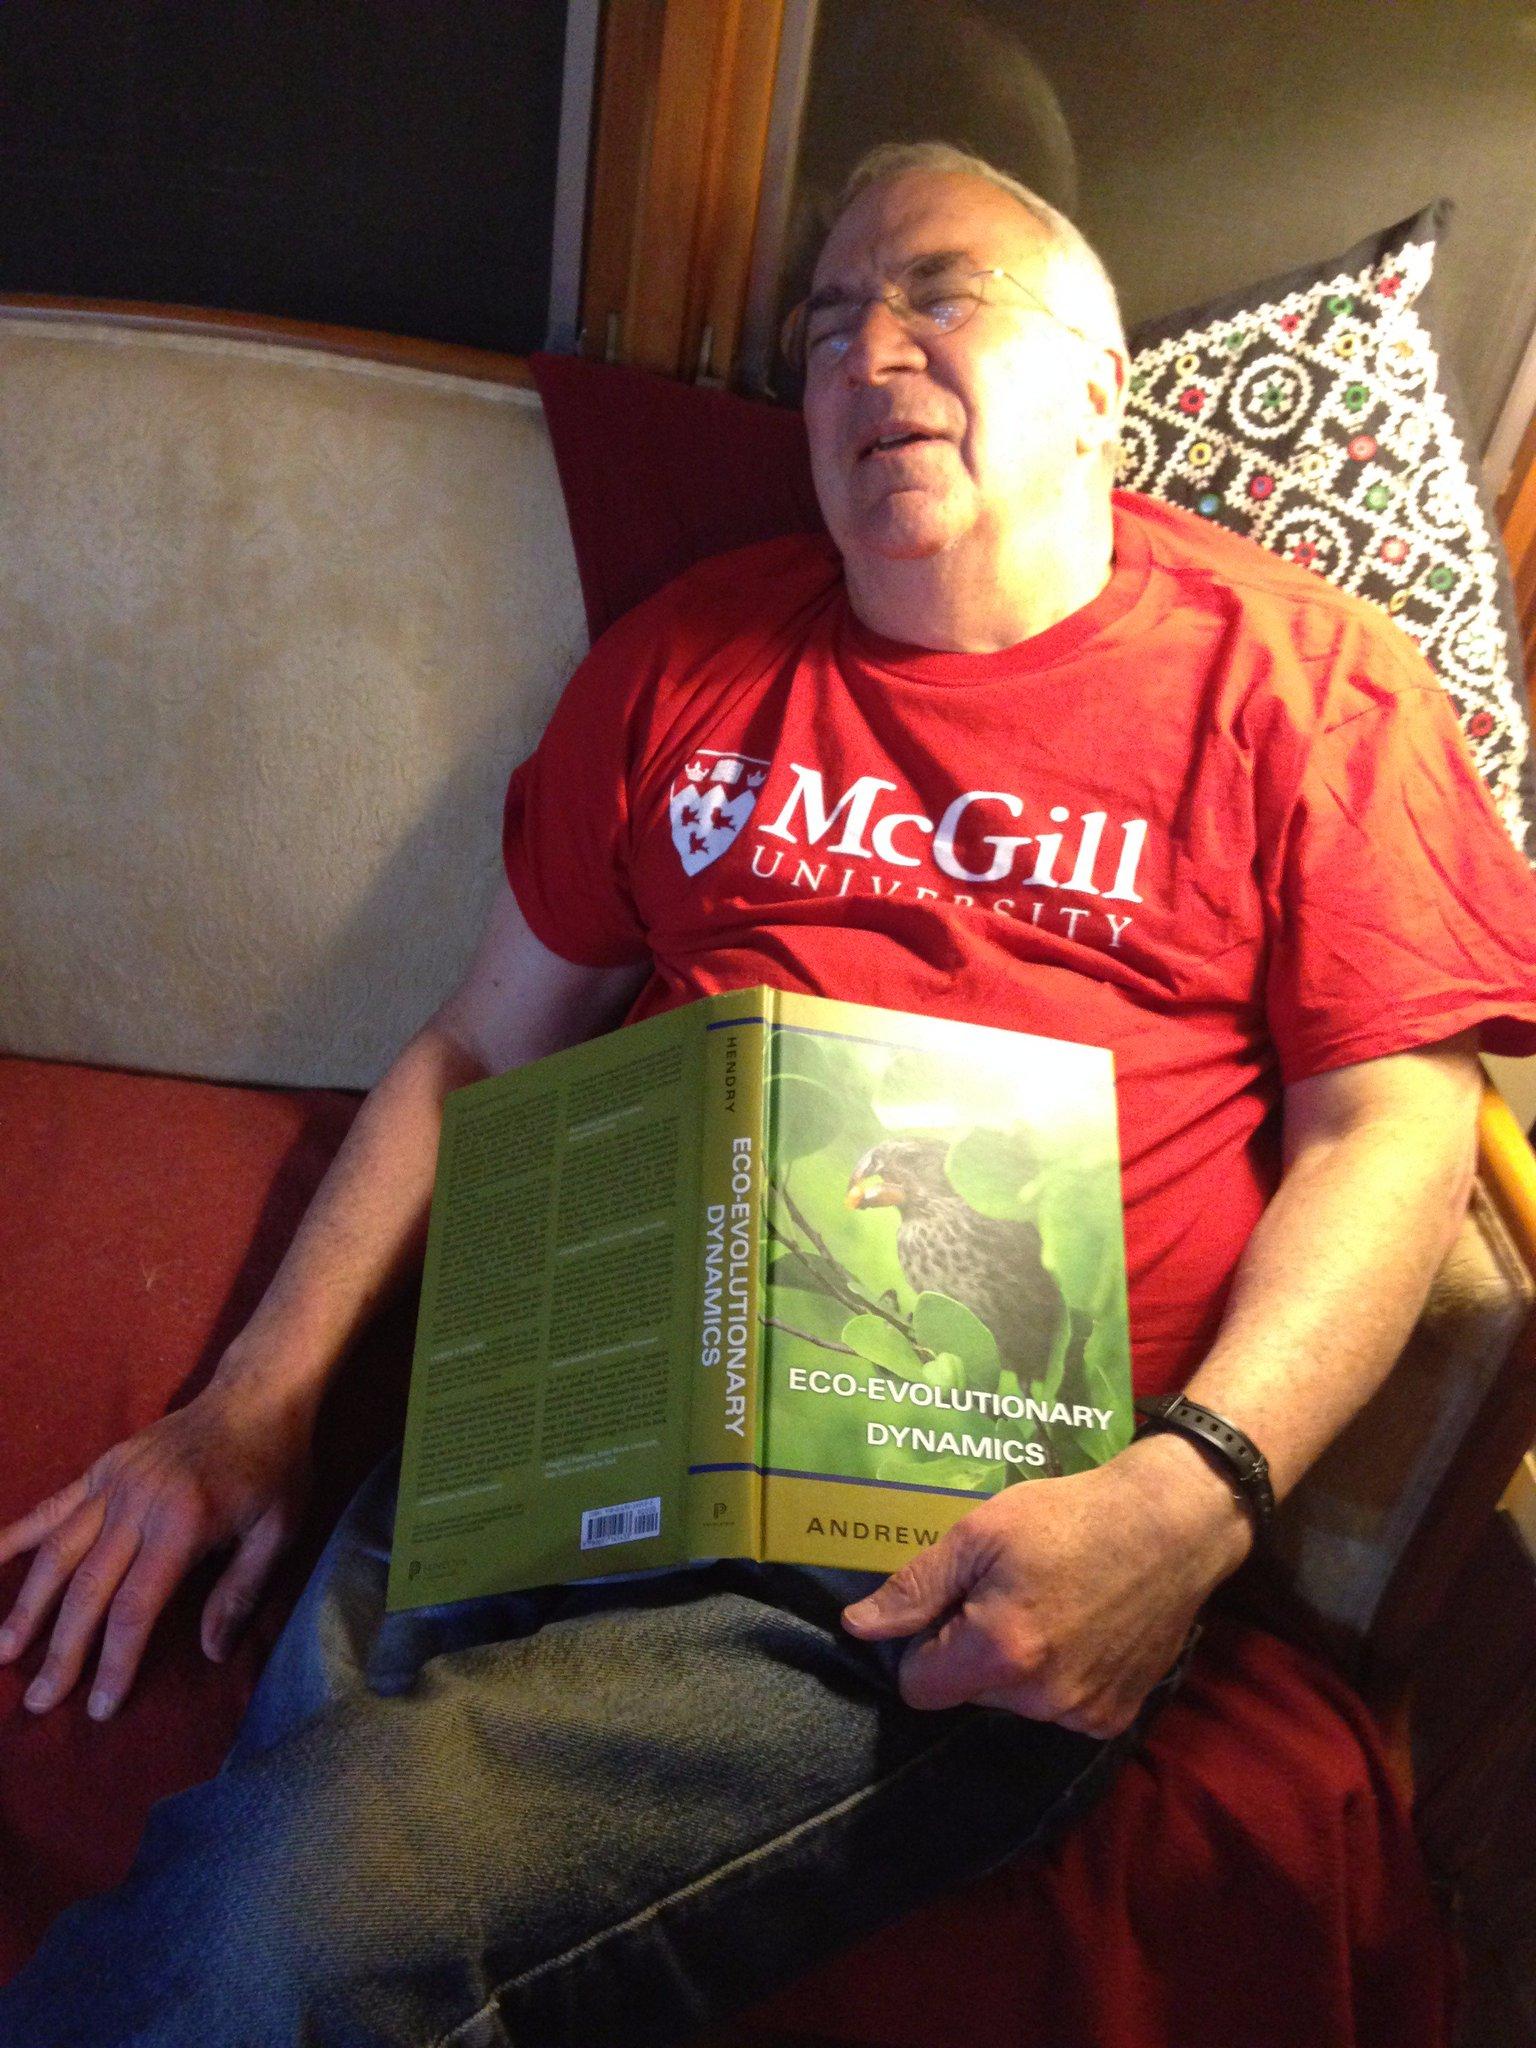 #PeopleWhoFellAsleepReadingMyBook Dan Simberloff - no, wait, maybe it's the @McGillU t-shirt not the book? @ASNAmNat @ESA_org @CSEE_SCEE https://t.co/ynYn1IXEVp